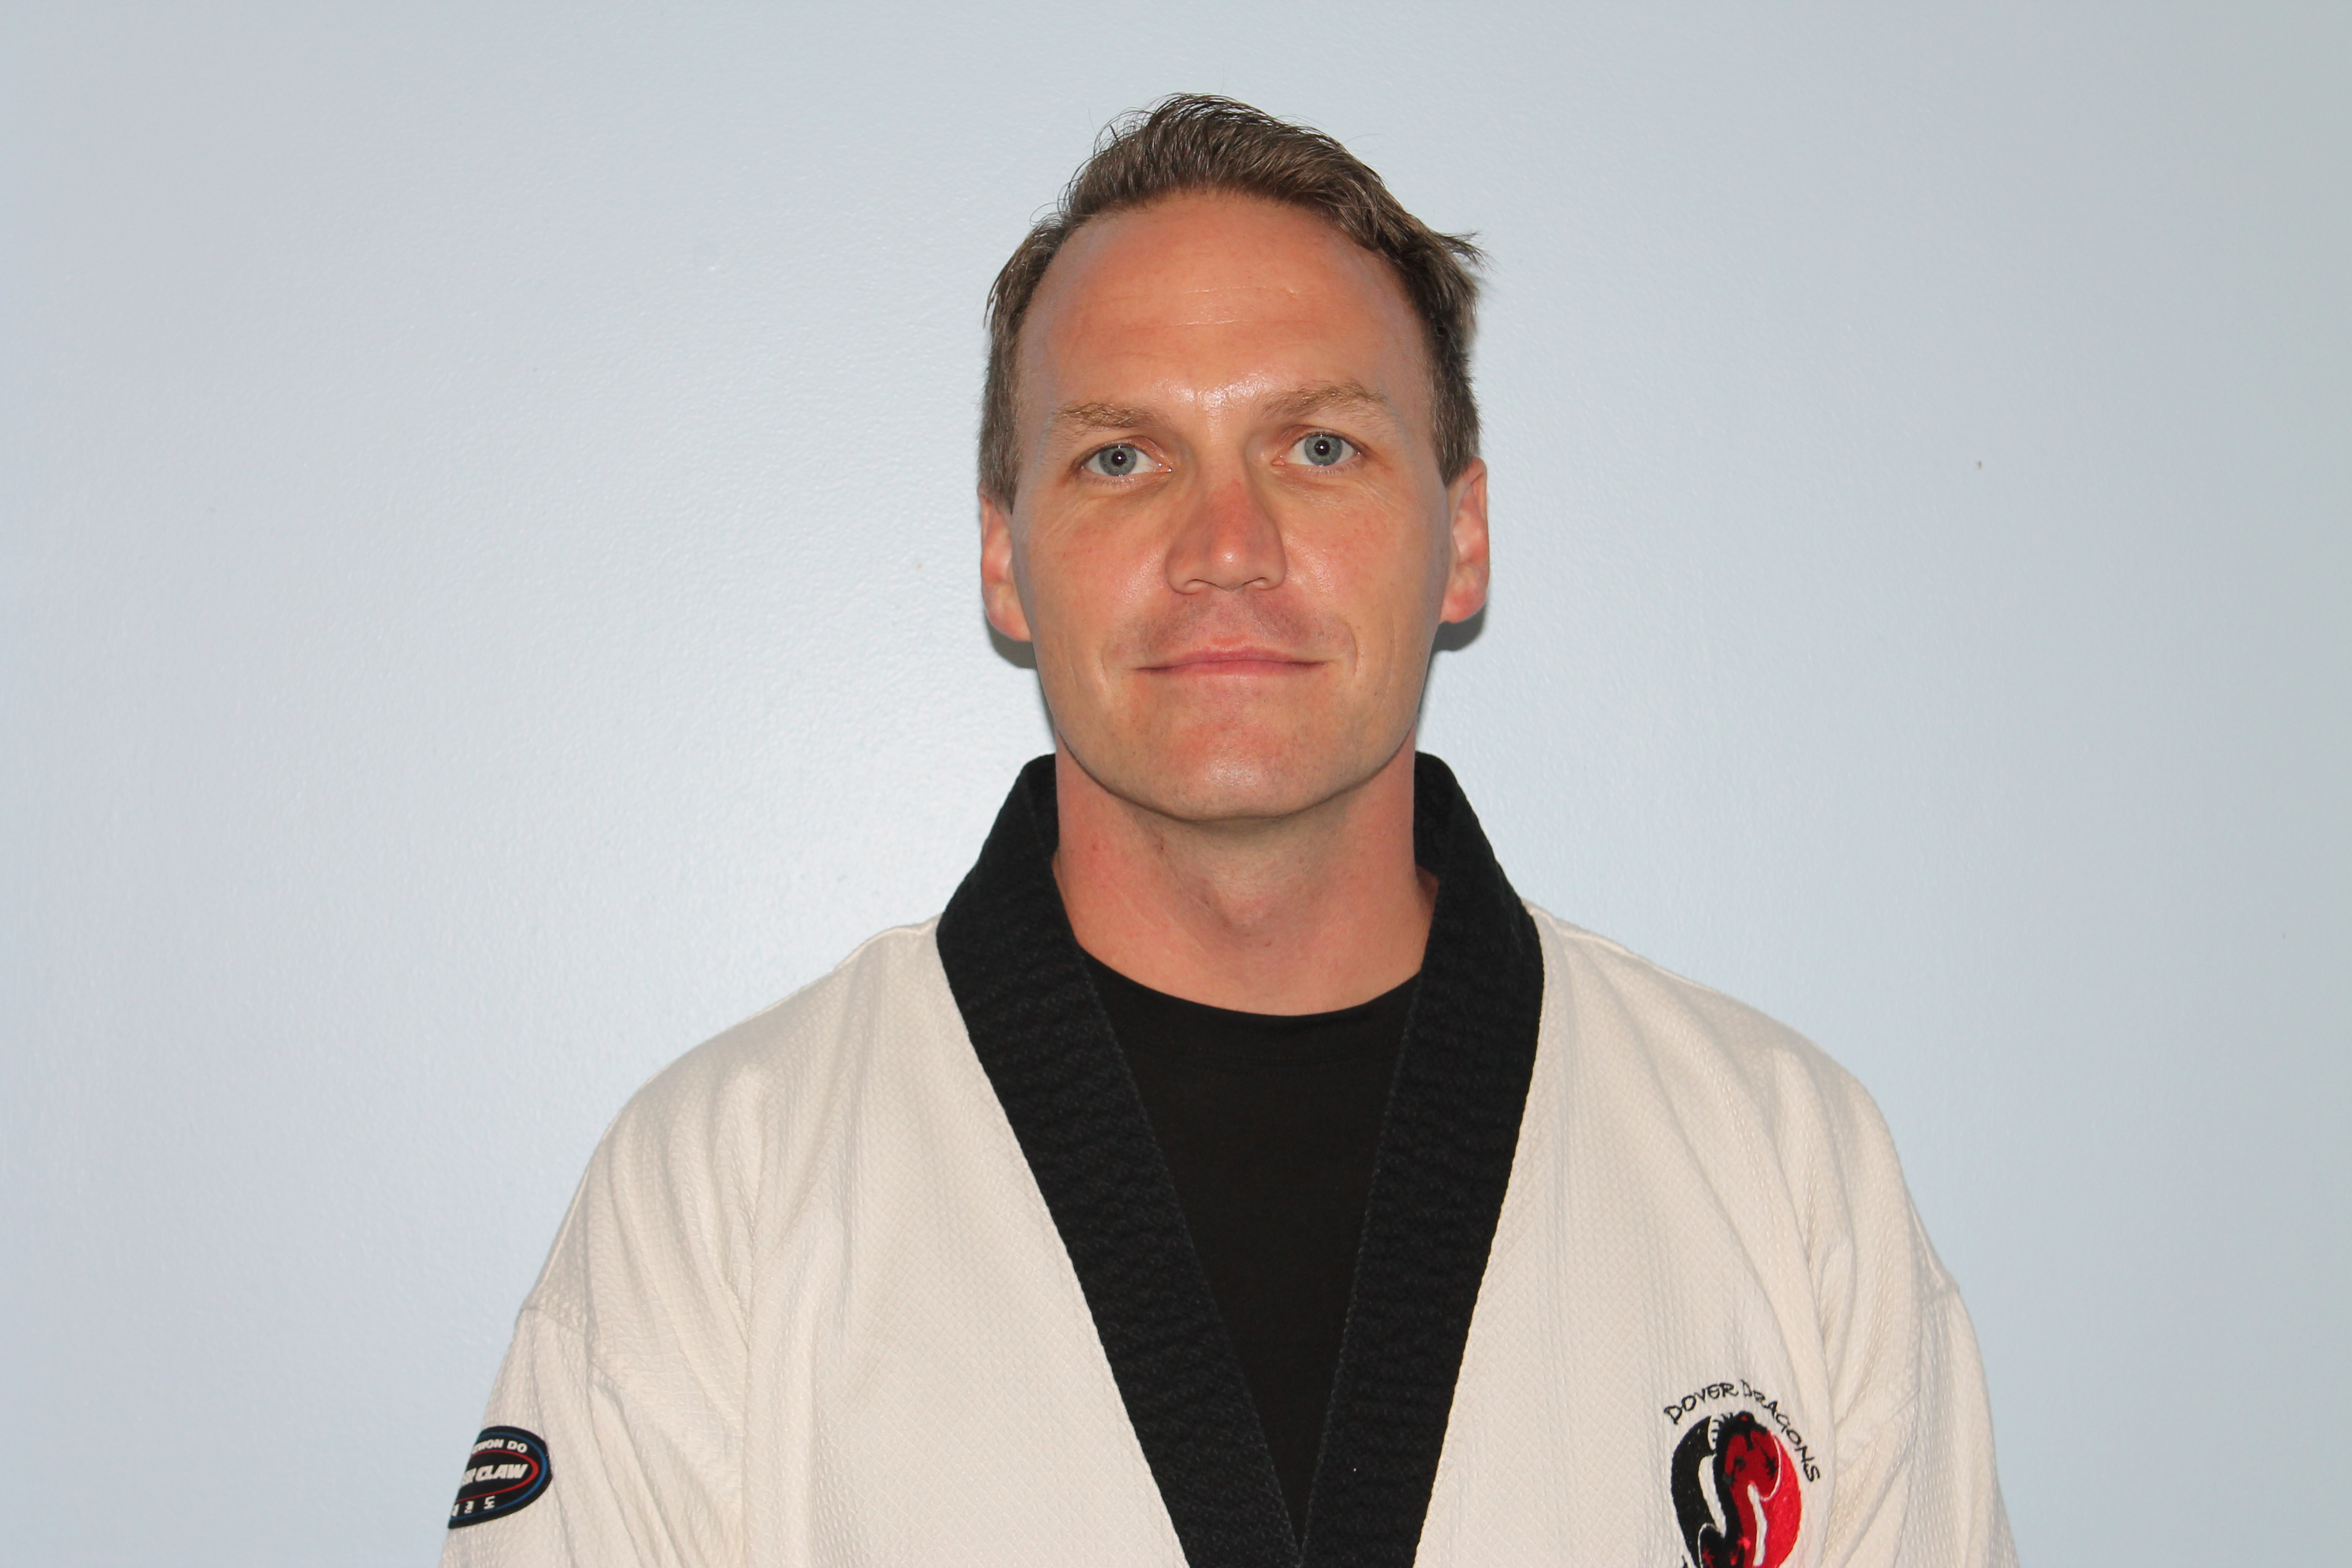 Master Bob Kistner